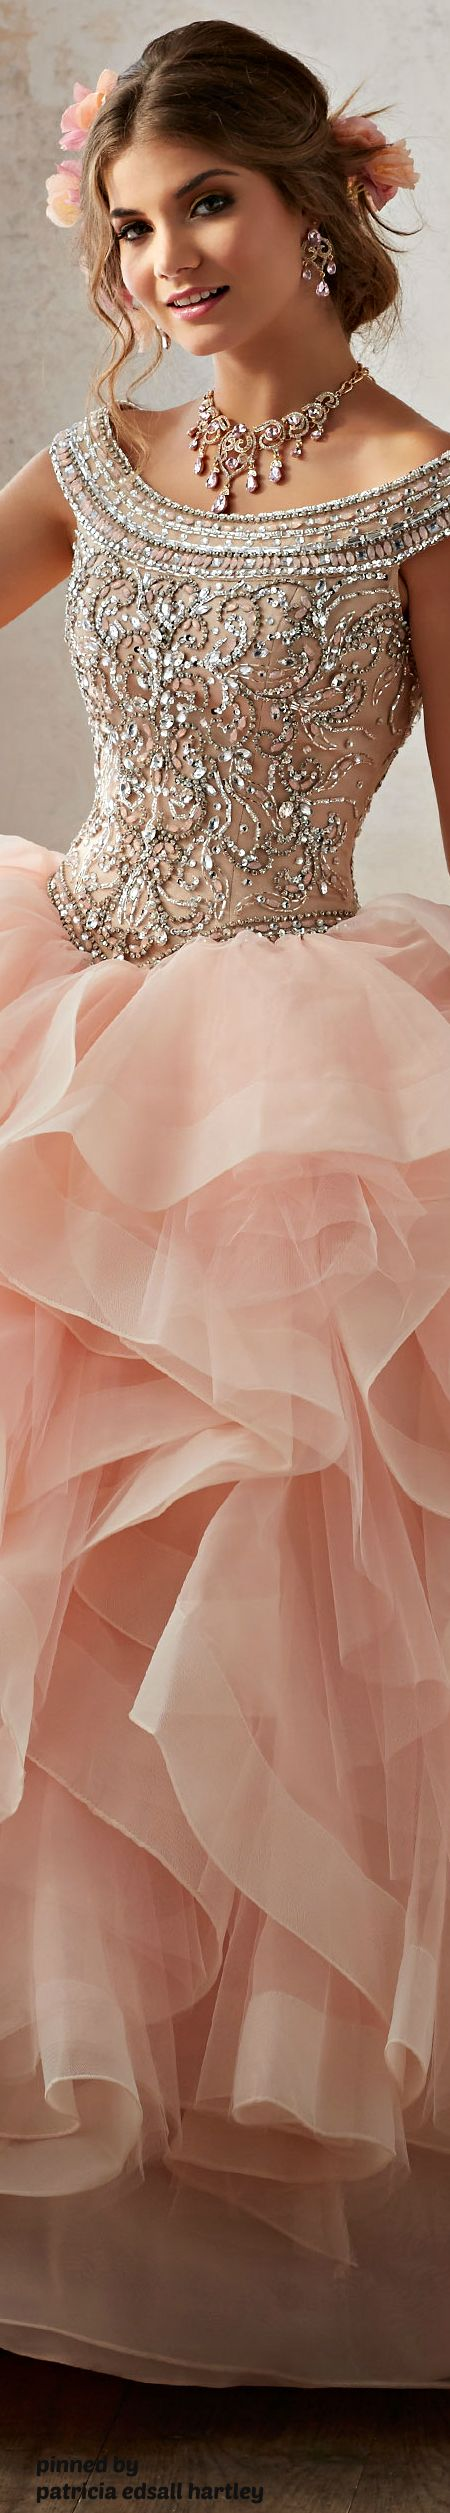 Beautiful blush wedding dress with crystal encrusted bodice cruise